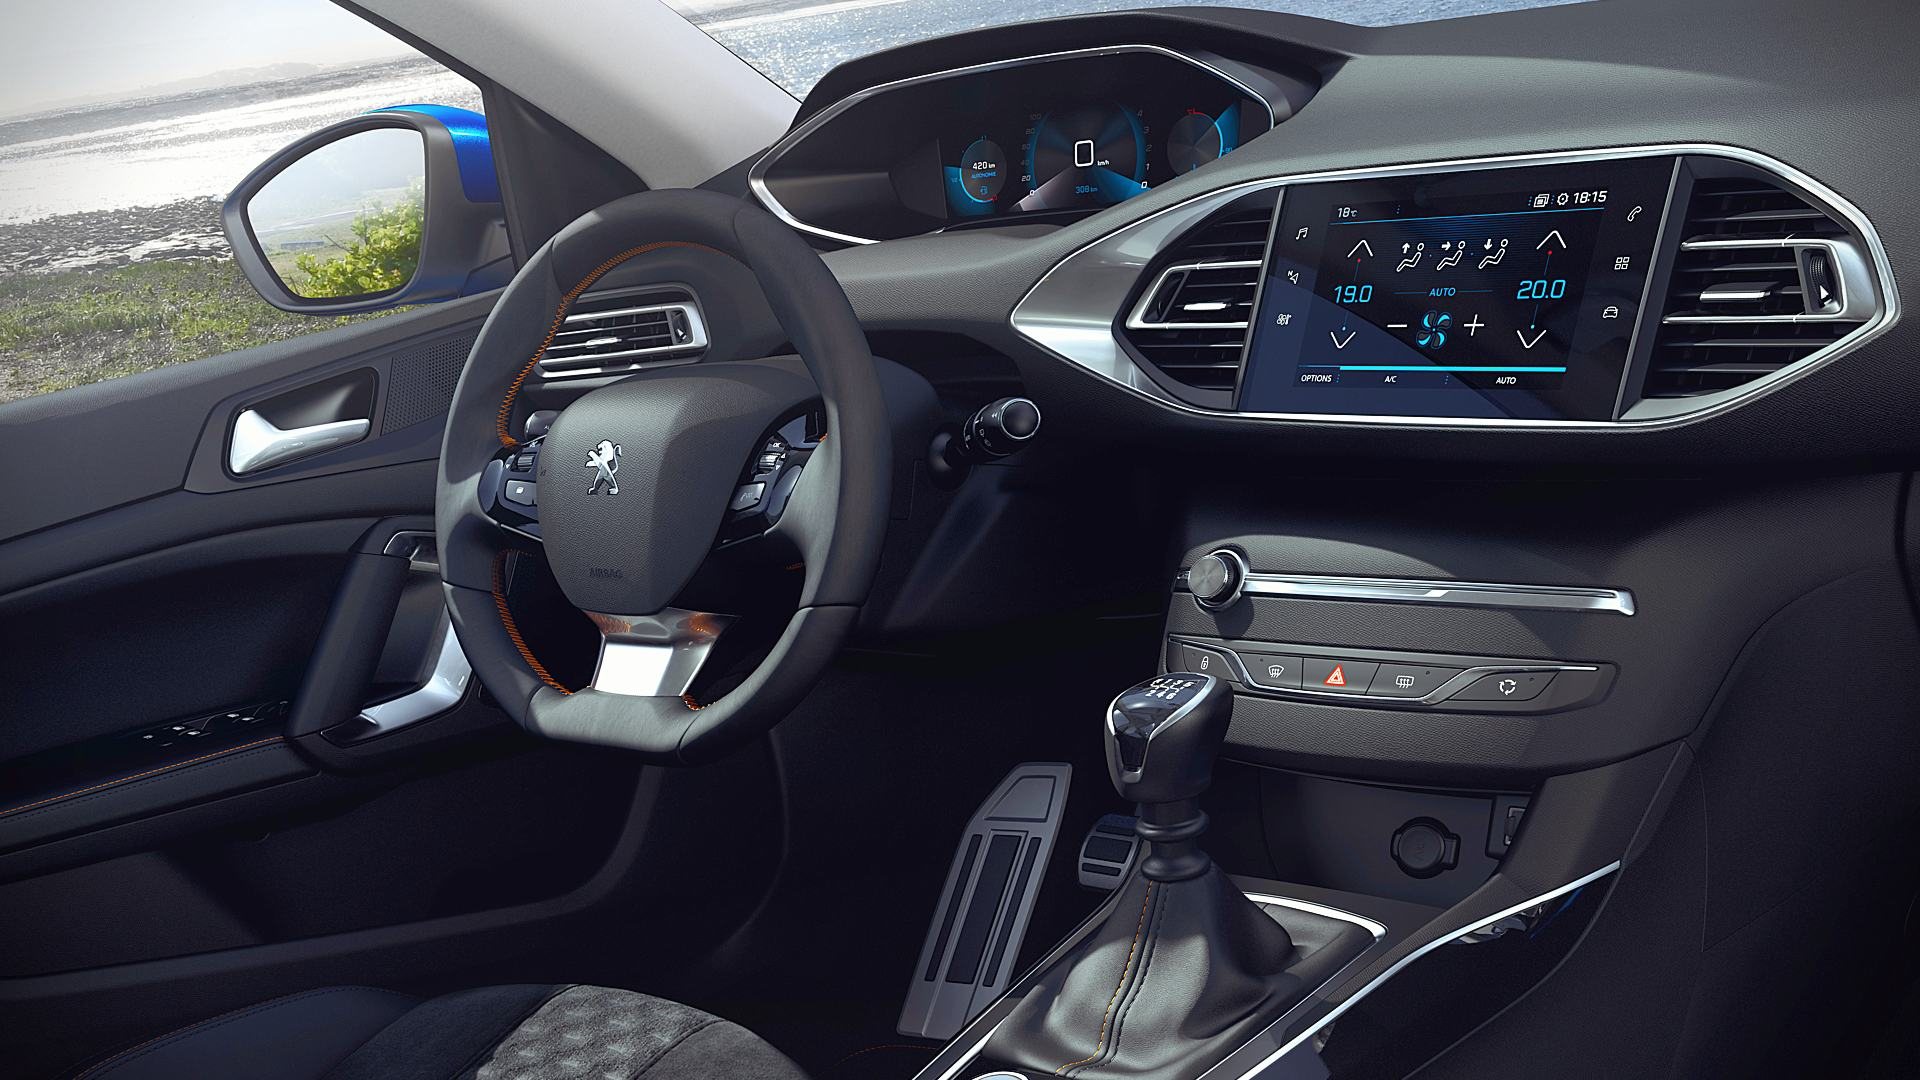 2021 Peugeot 308 New Concept